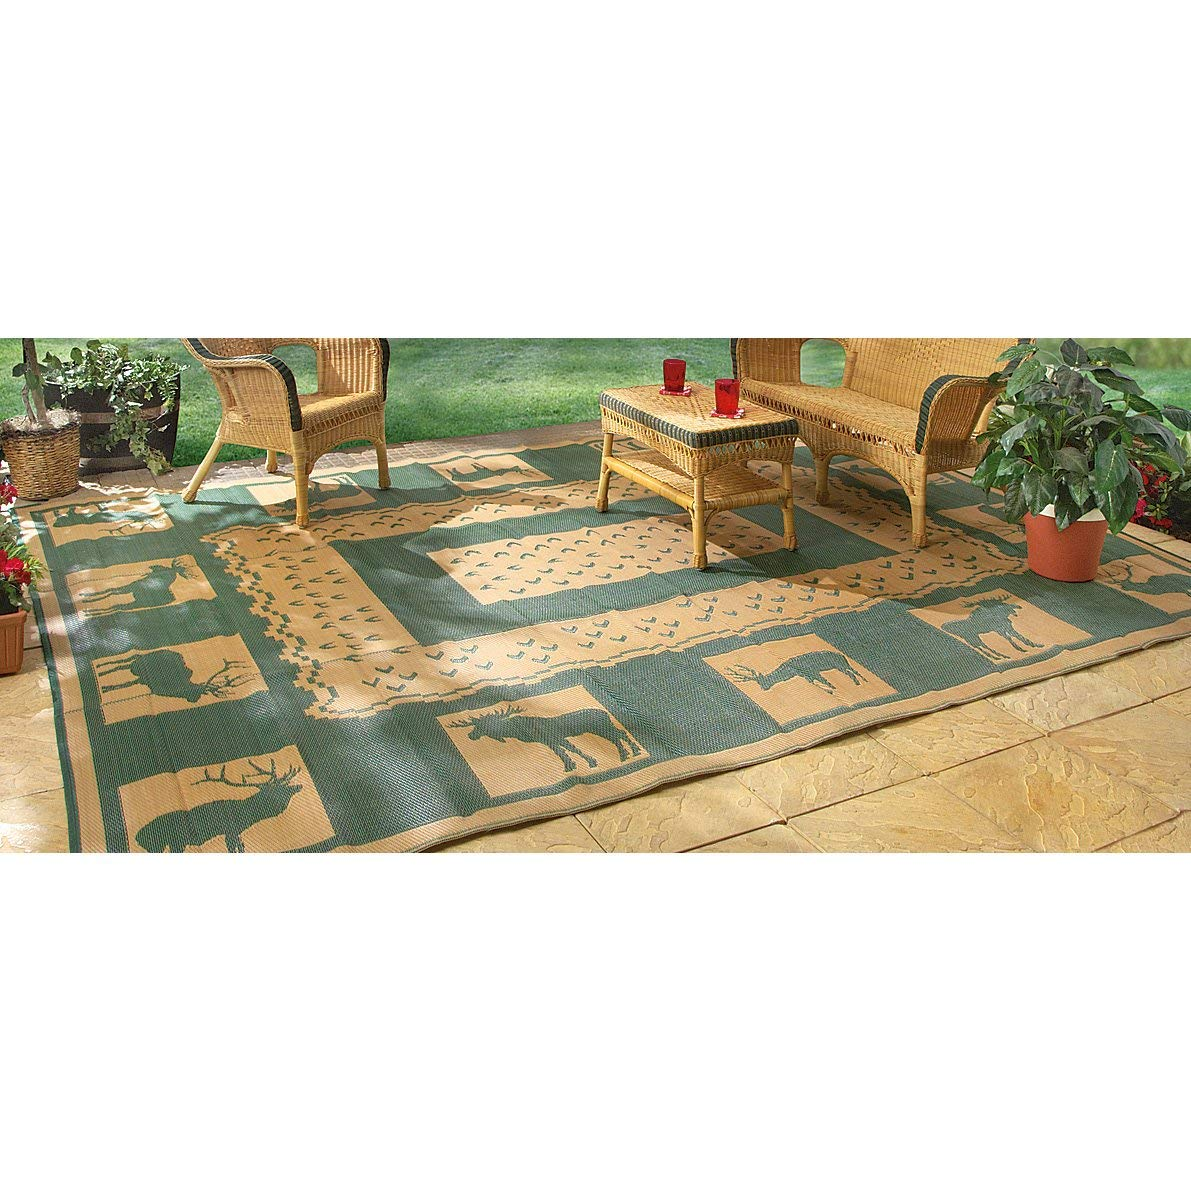 Outdoor patio carpets amazon.com : guide gear 6u0027 x 9u0027 reversible lodge patio mat khaki / MCWZBIC